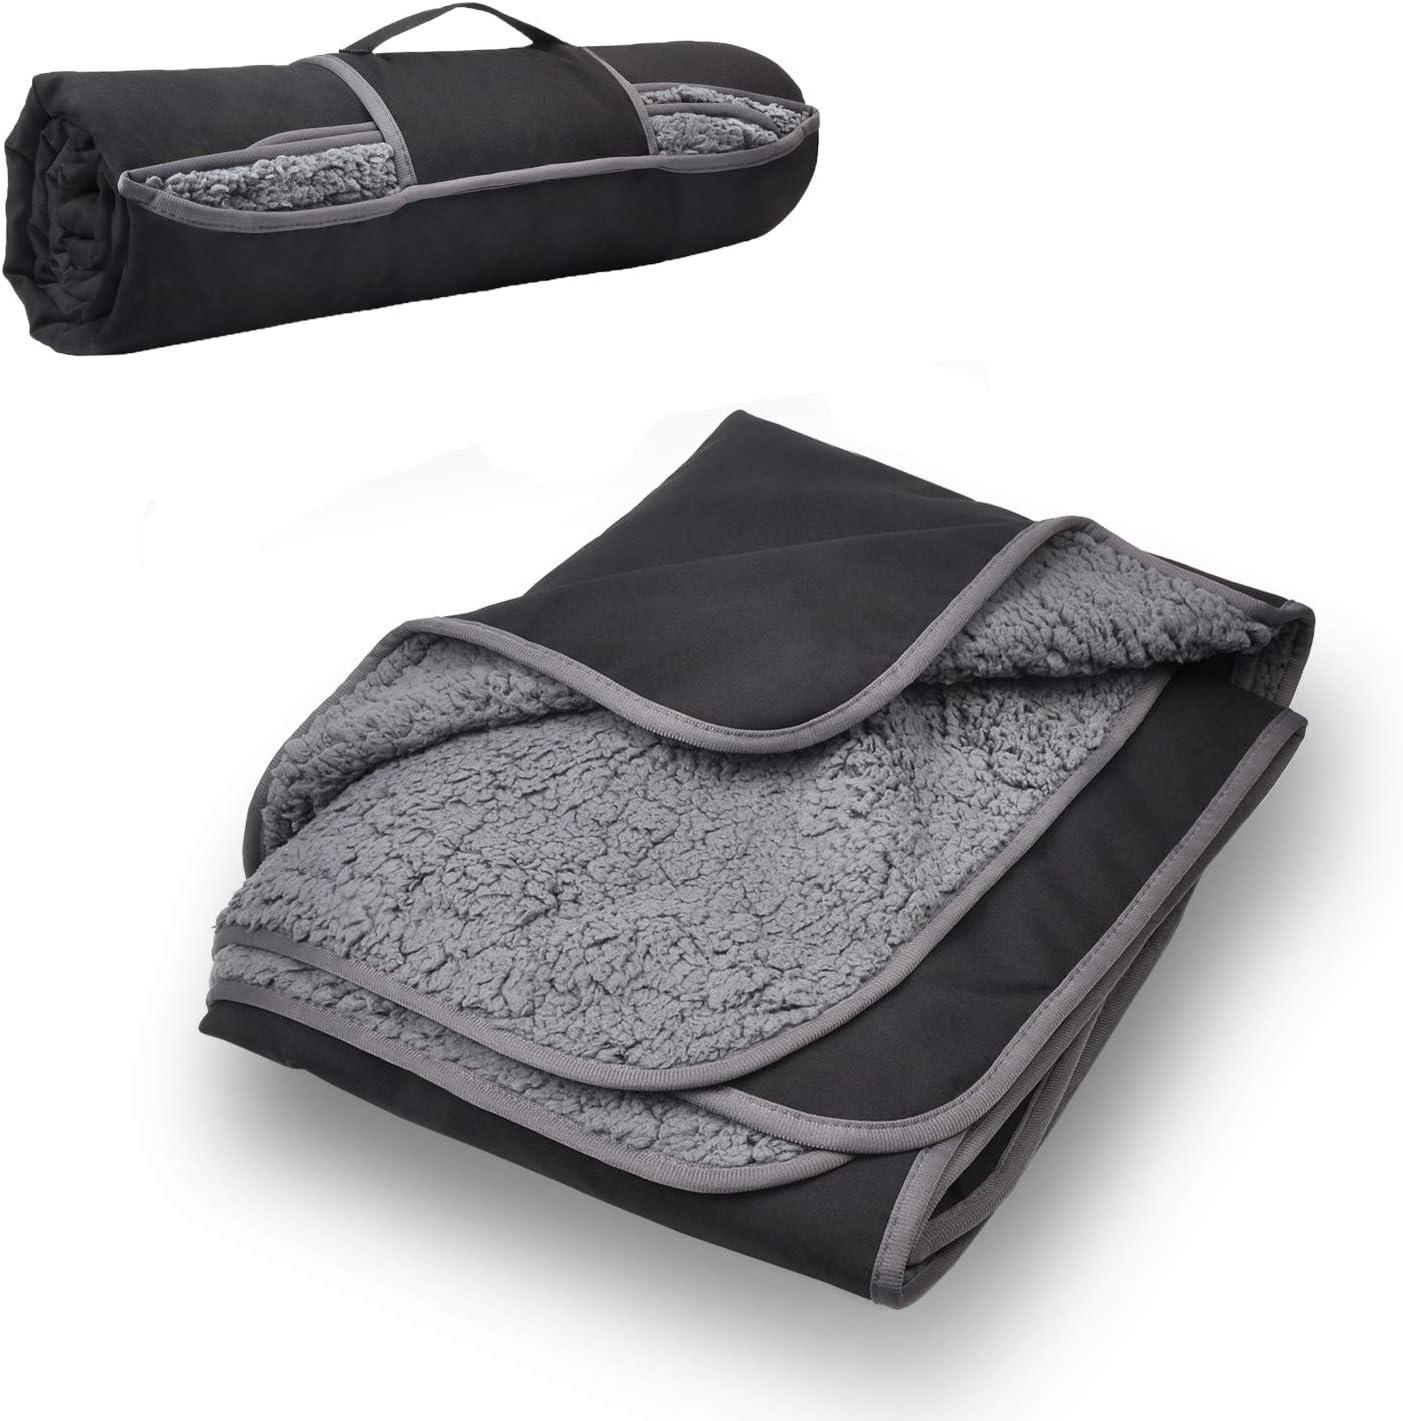 "Tirrinia Outdoors Waterproof Throw Blanket, 59""x 79"" Sherpa Fleece Stadium Windproof Mat for Traveling, Camping, Hiking, Football - Machine Washable"